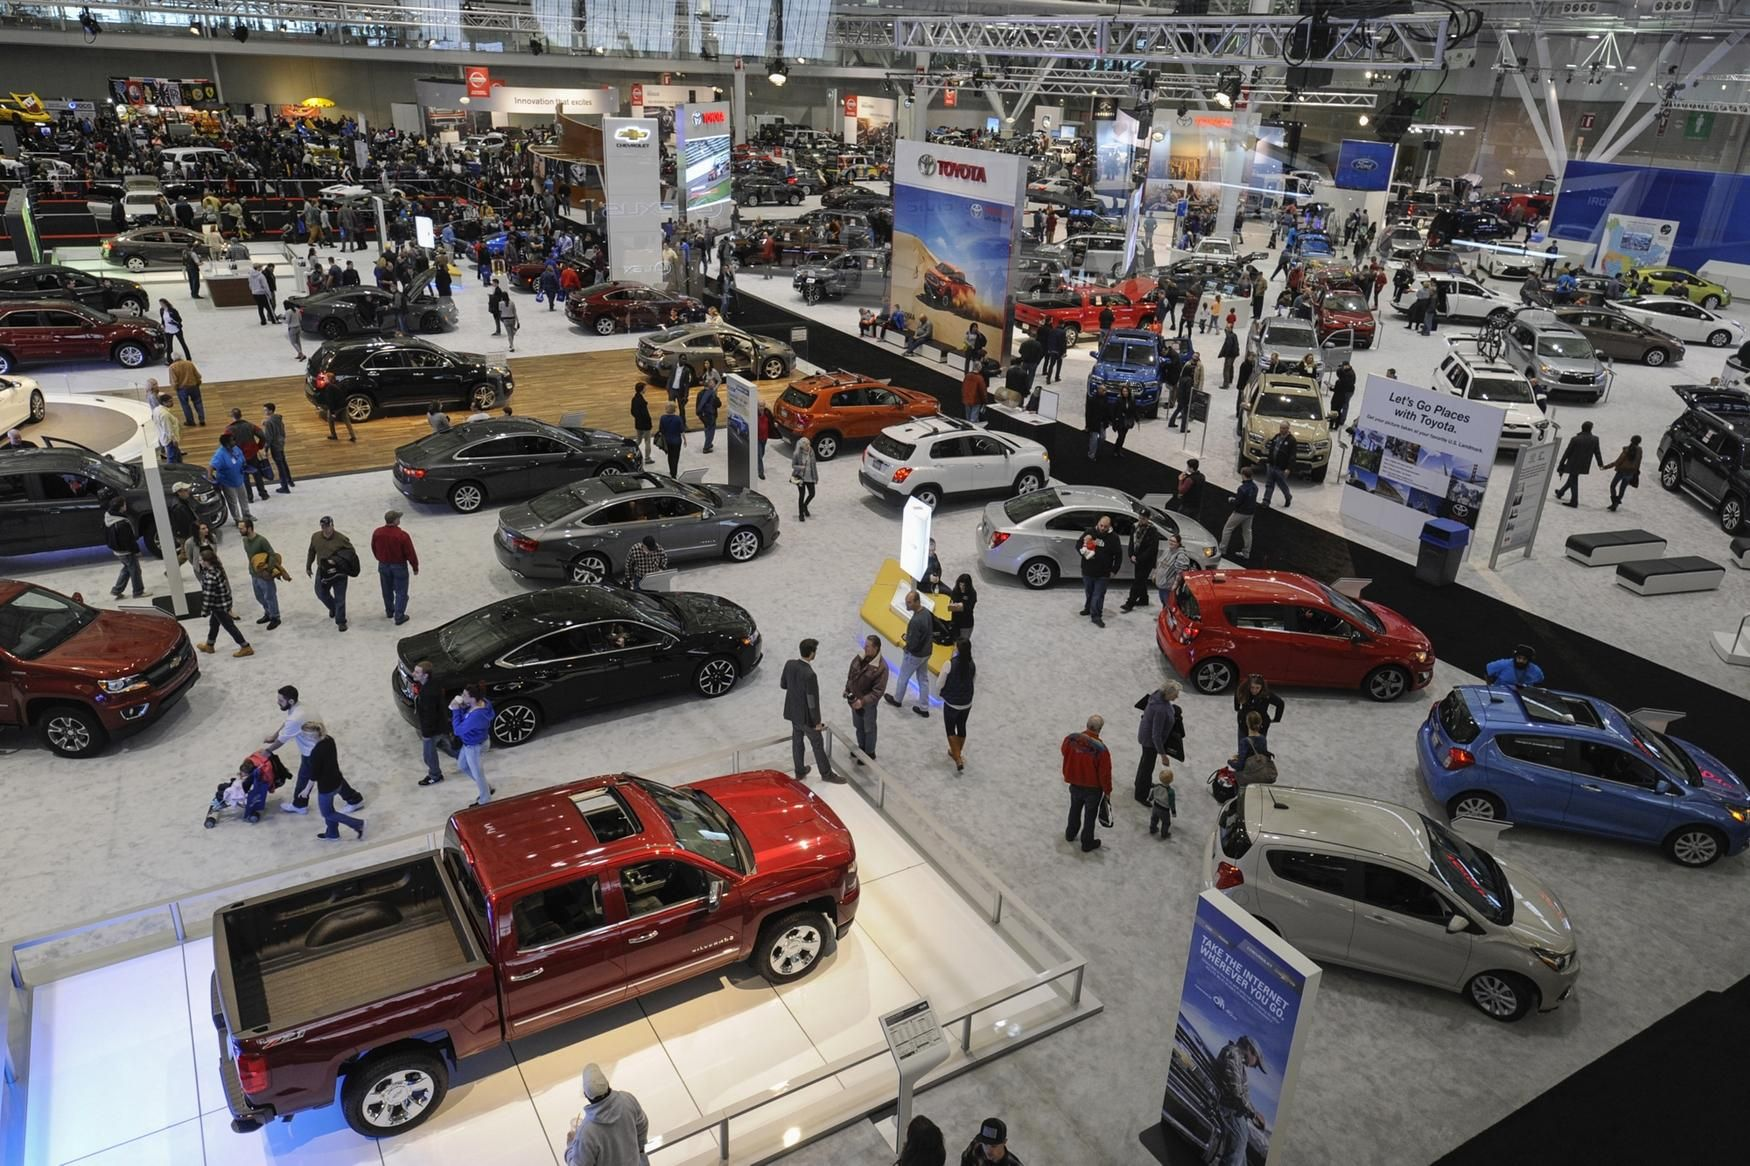 Httpwwwinstagramcomautodetailhotspot The New England - Auto car show convention center